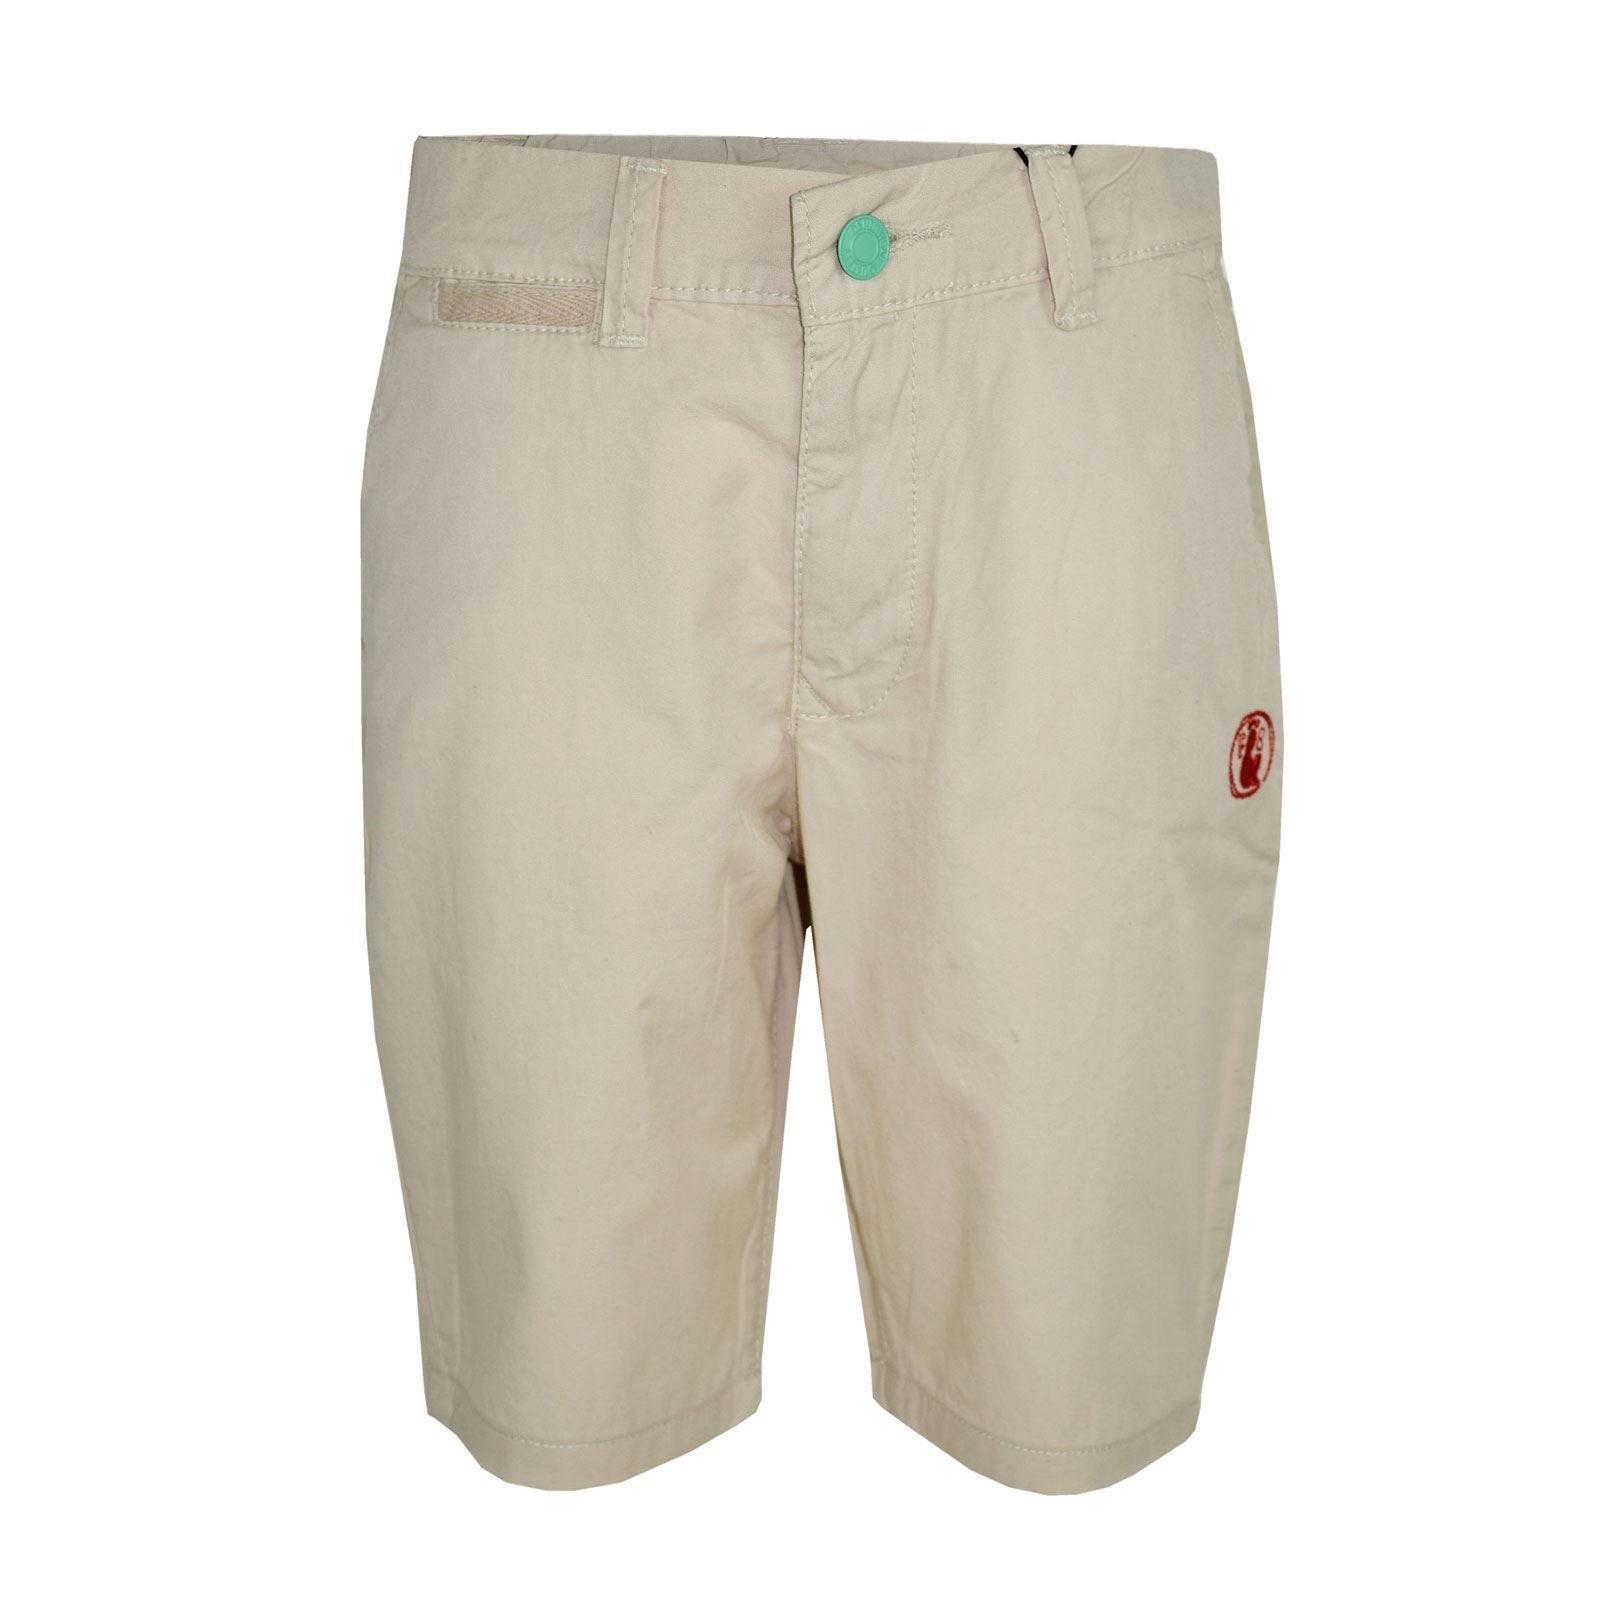 A2Z 4 Kids/® Boys Summer Shorts Kids Fleece Blue Chino Shorts Knee Length Half Pant New Age 3 4 5 6 7 8 9 10 11 12 13 Years